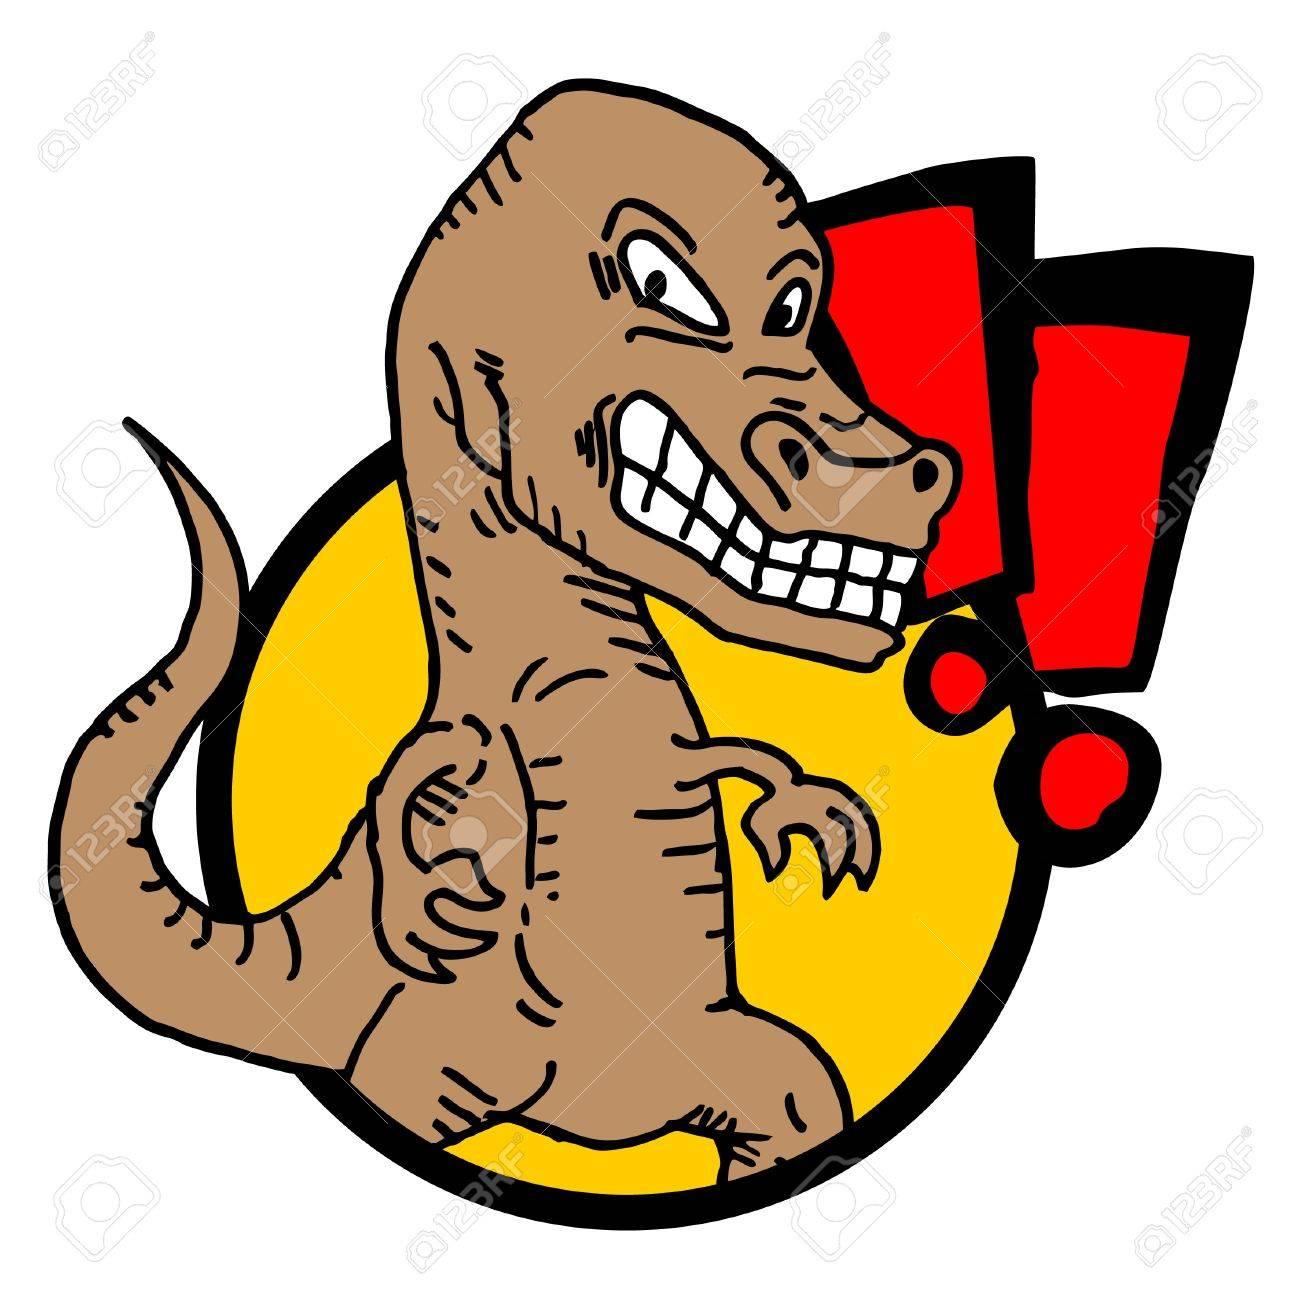 Tyrannosaurus rex icon Stock Vector - 11104372